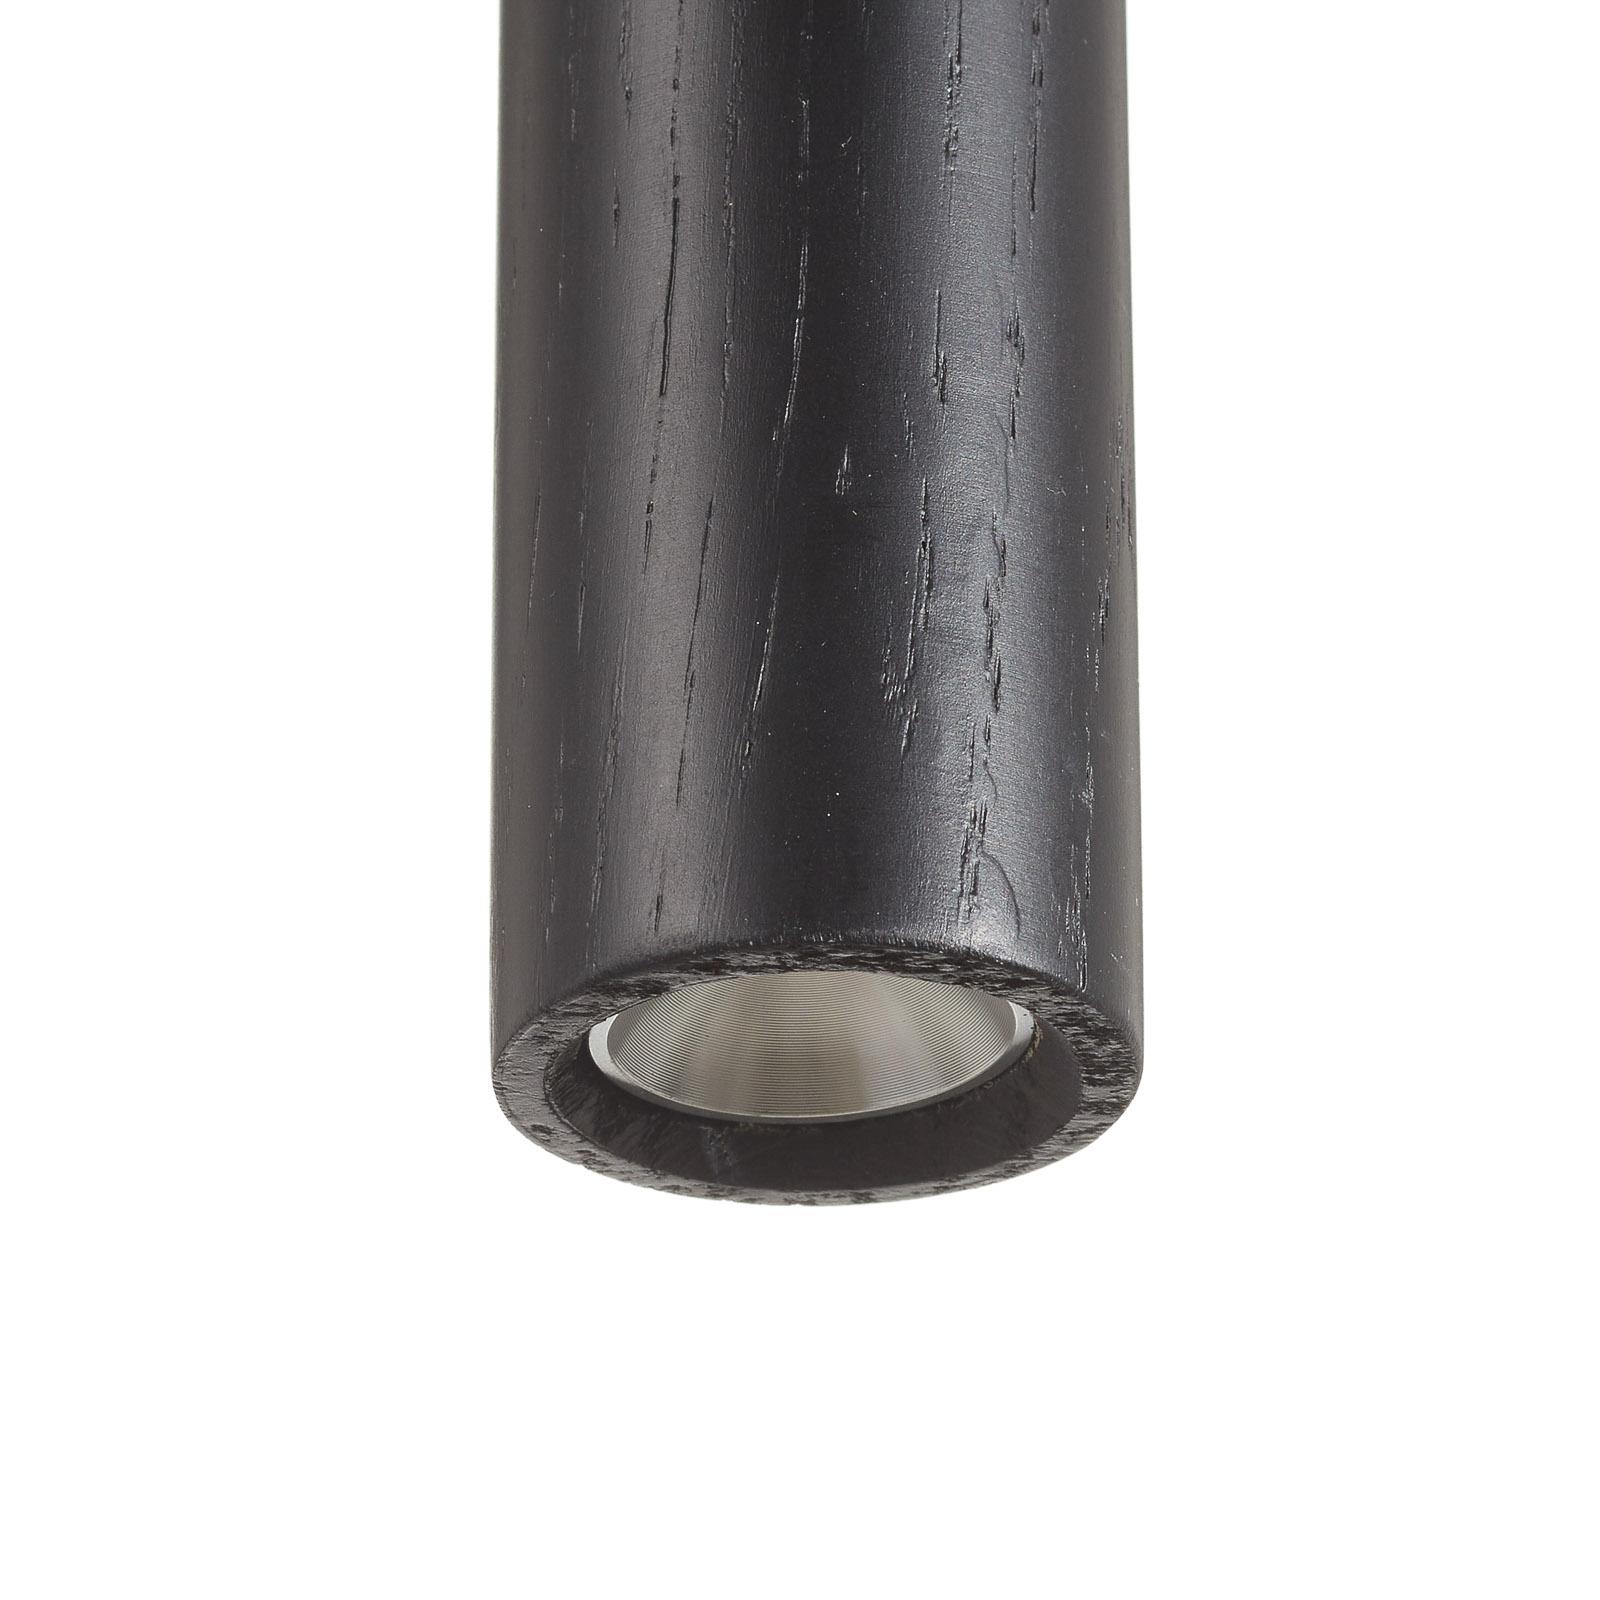 UMAGE Chimes Cluster 3 lampa wisząca dąb czarna